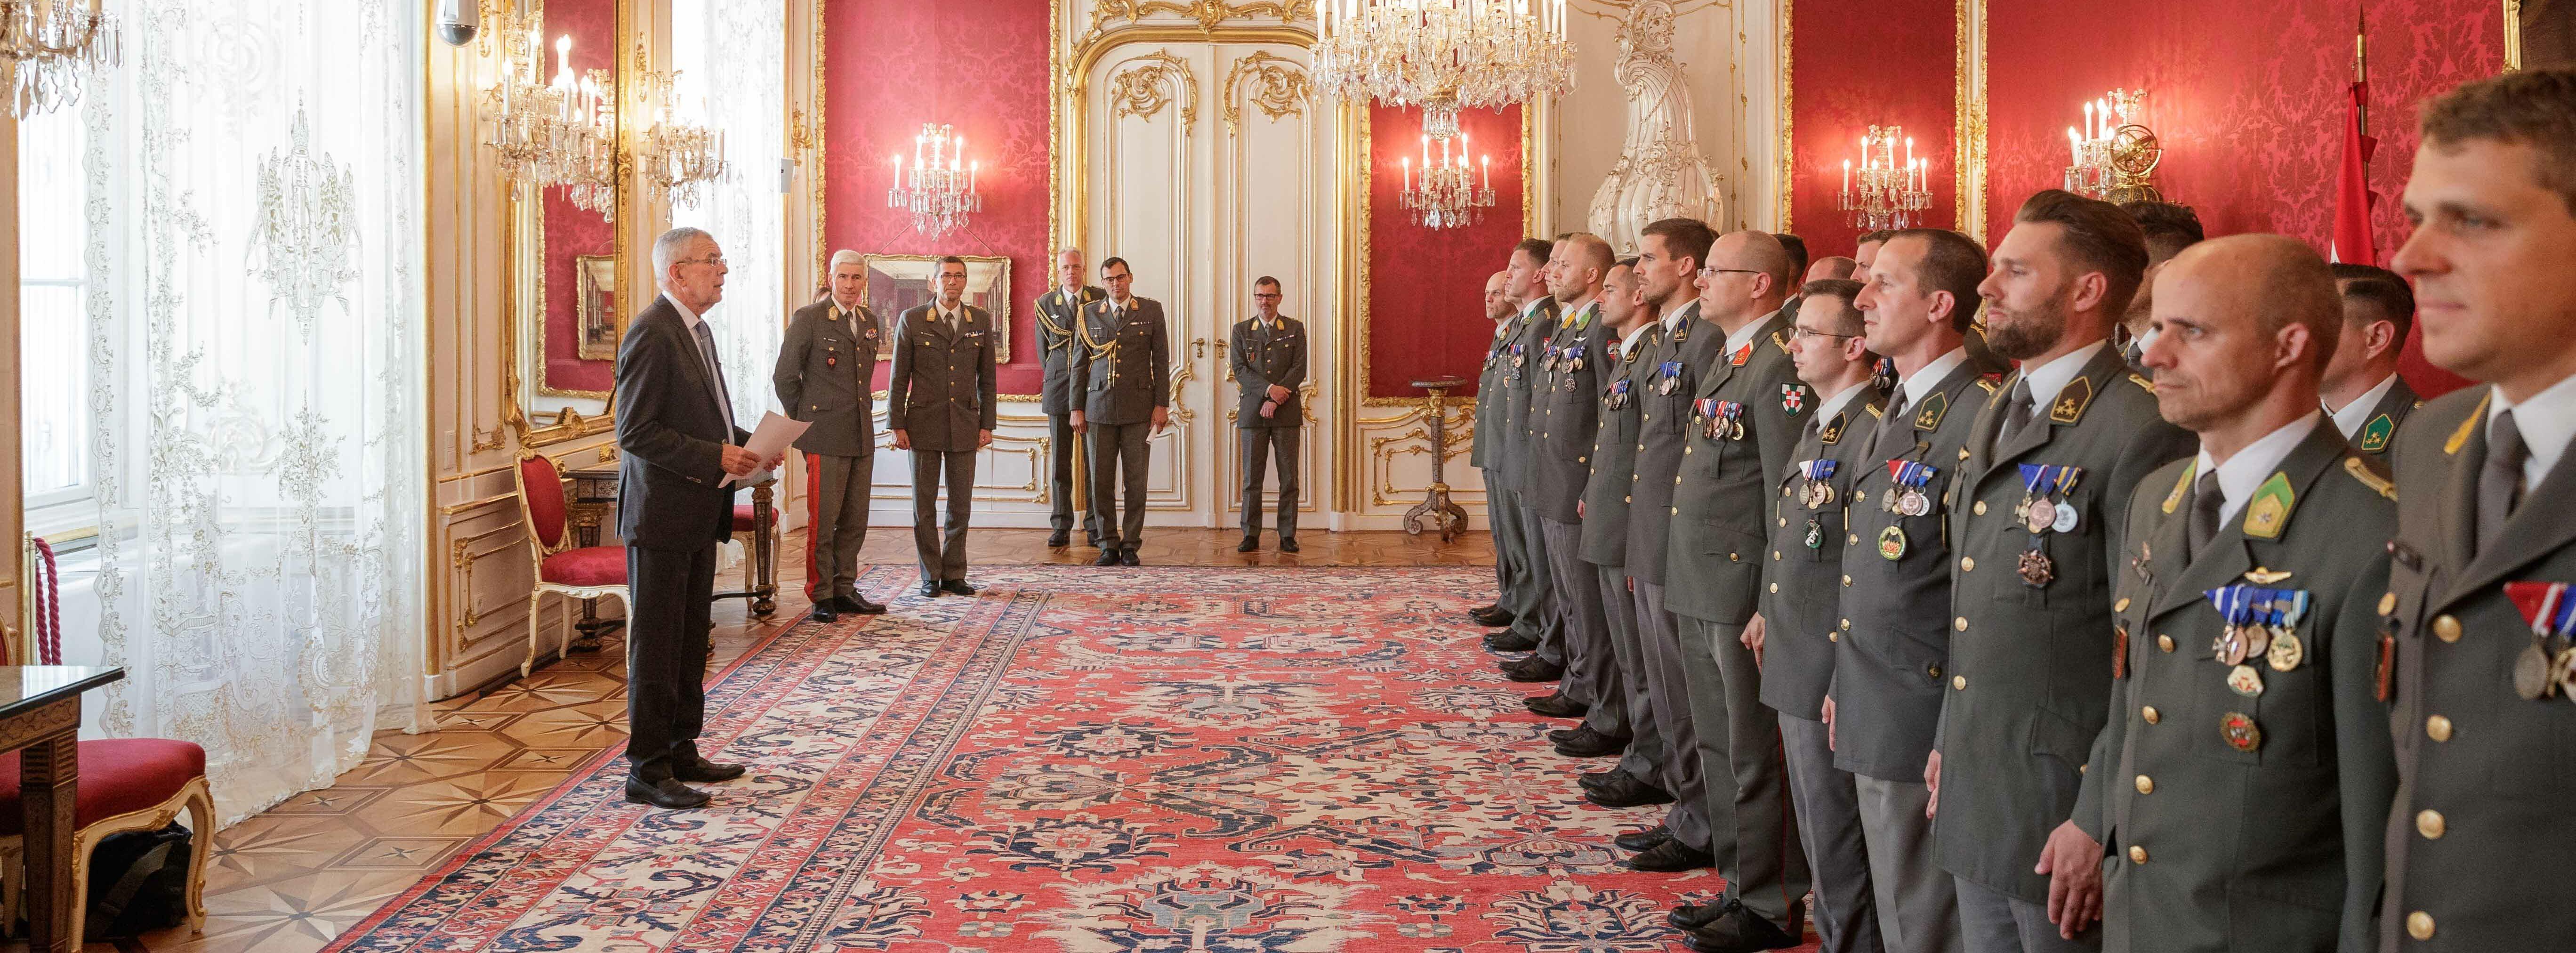 Ausmusterung 21. Generalstabslehrgang